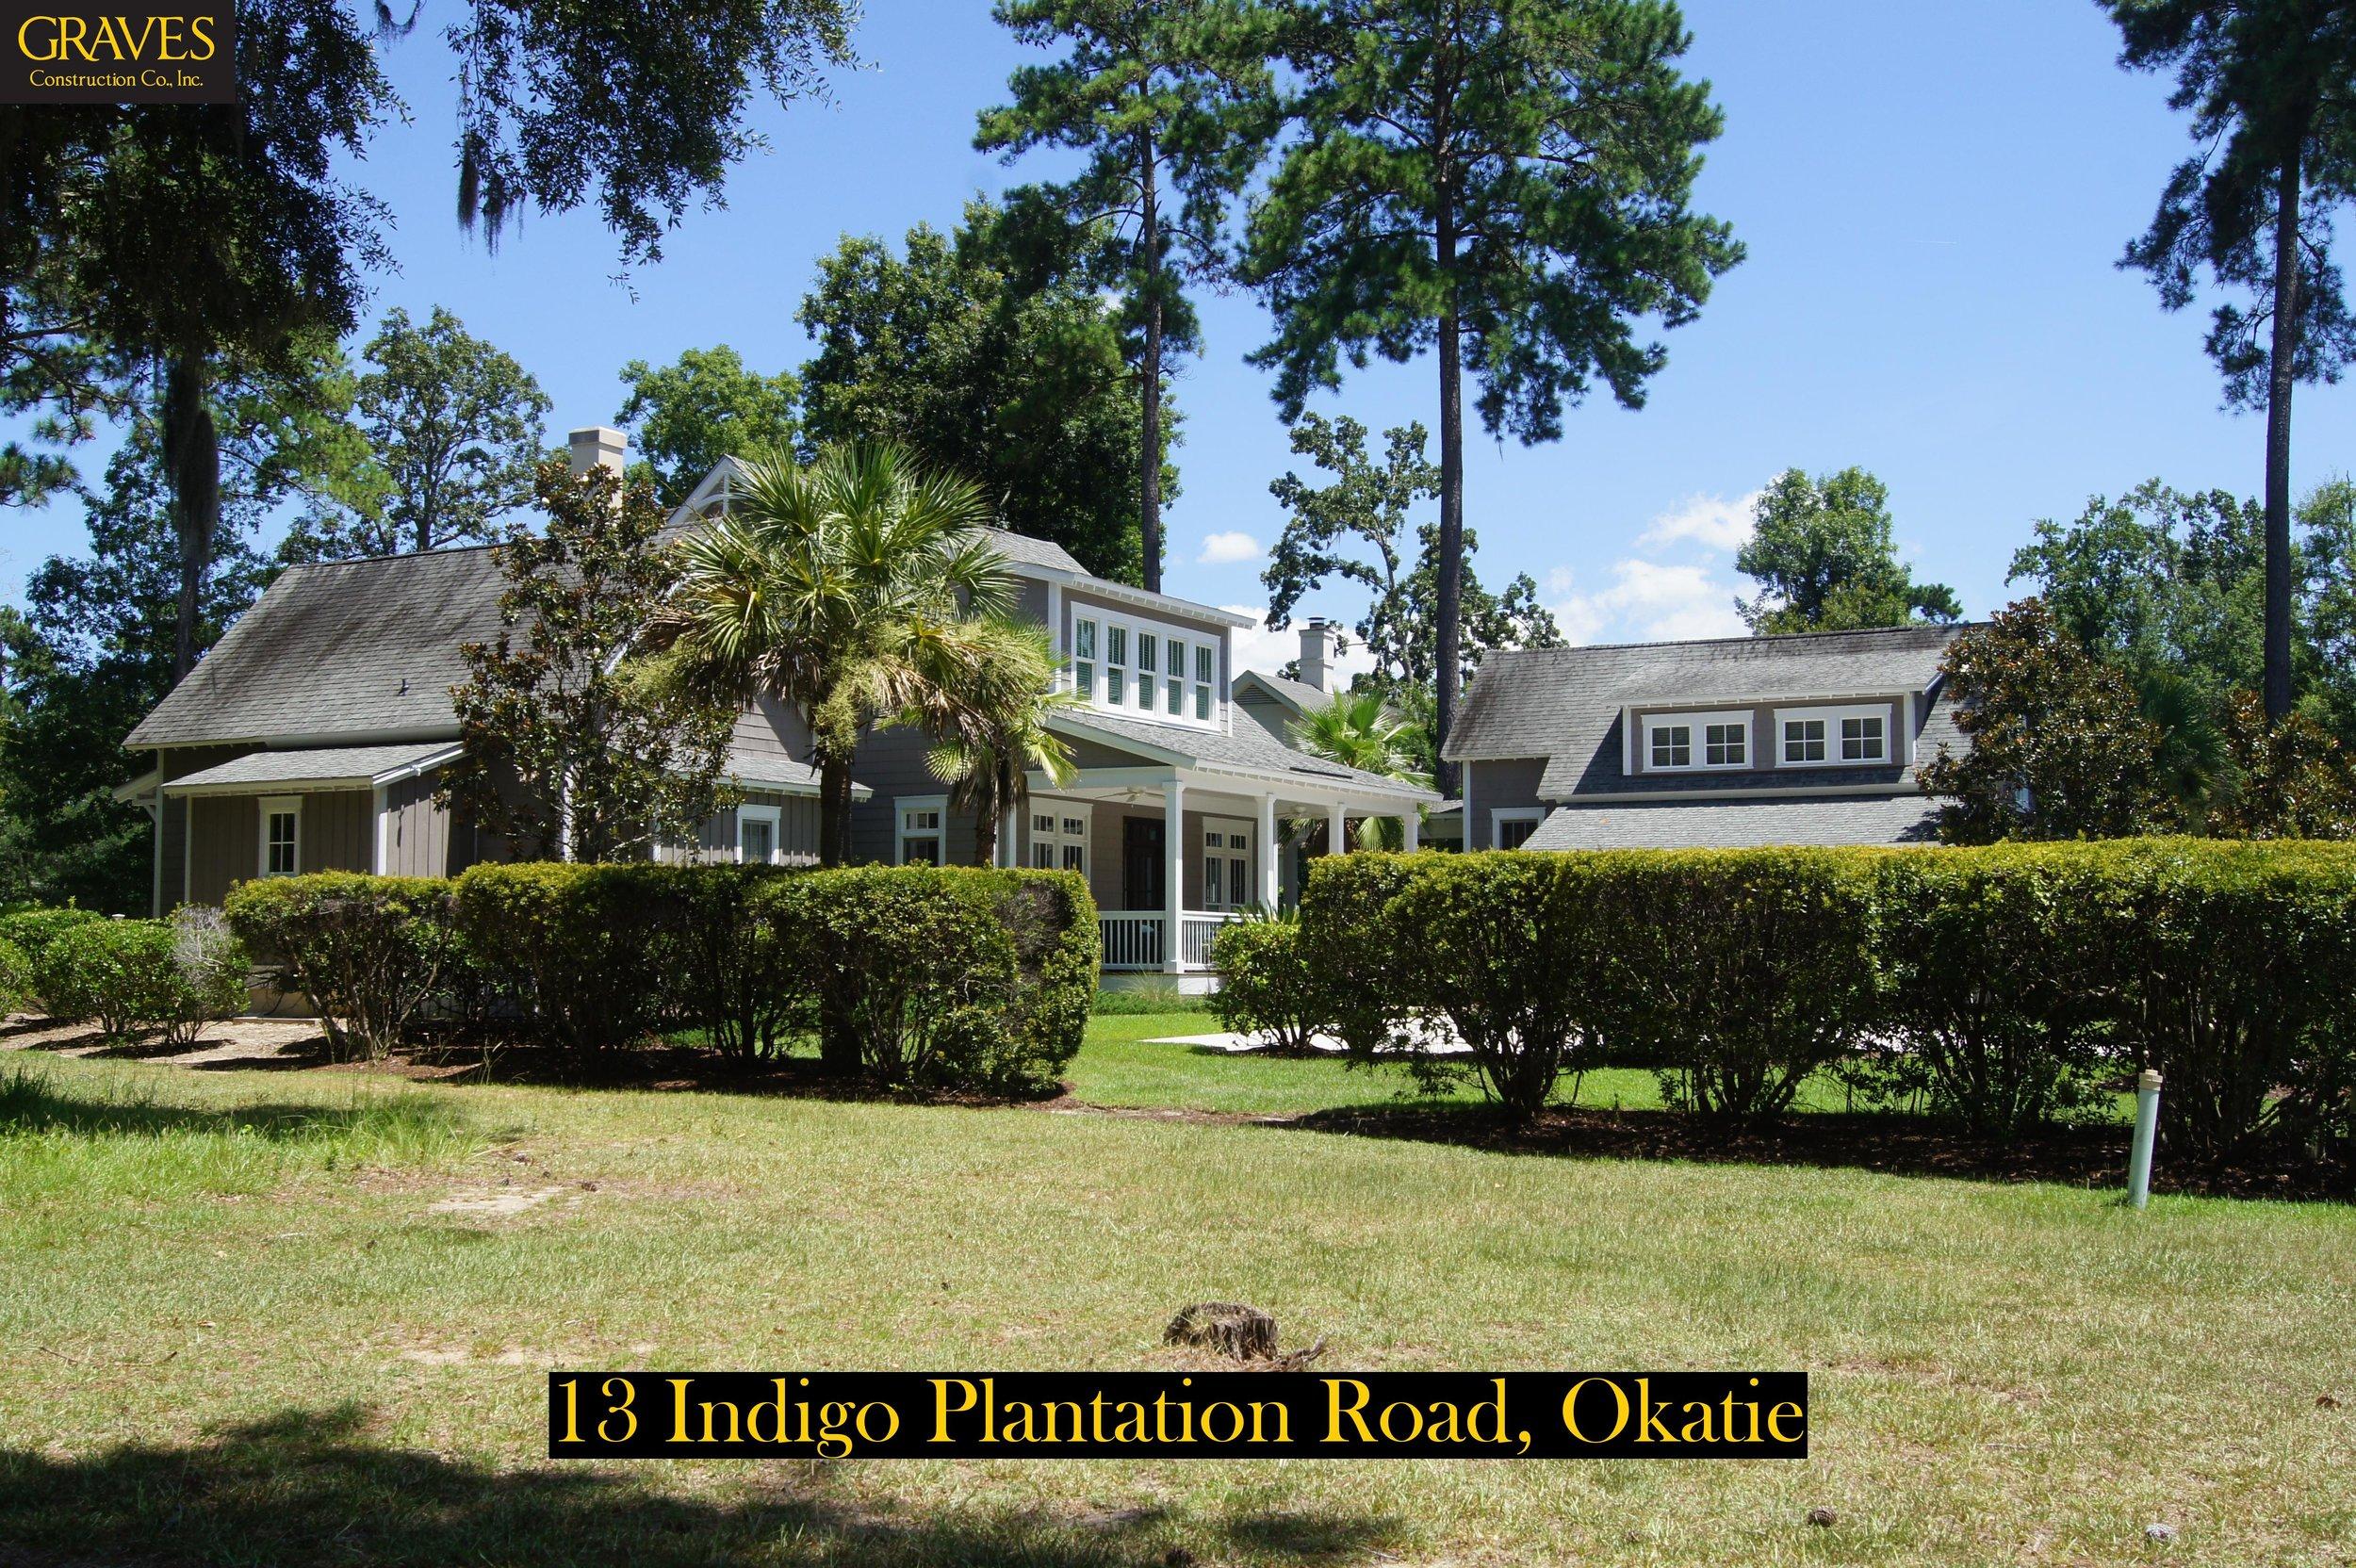 13 Indigo Plantation Rd - 5